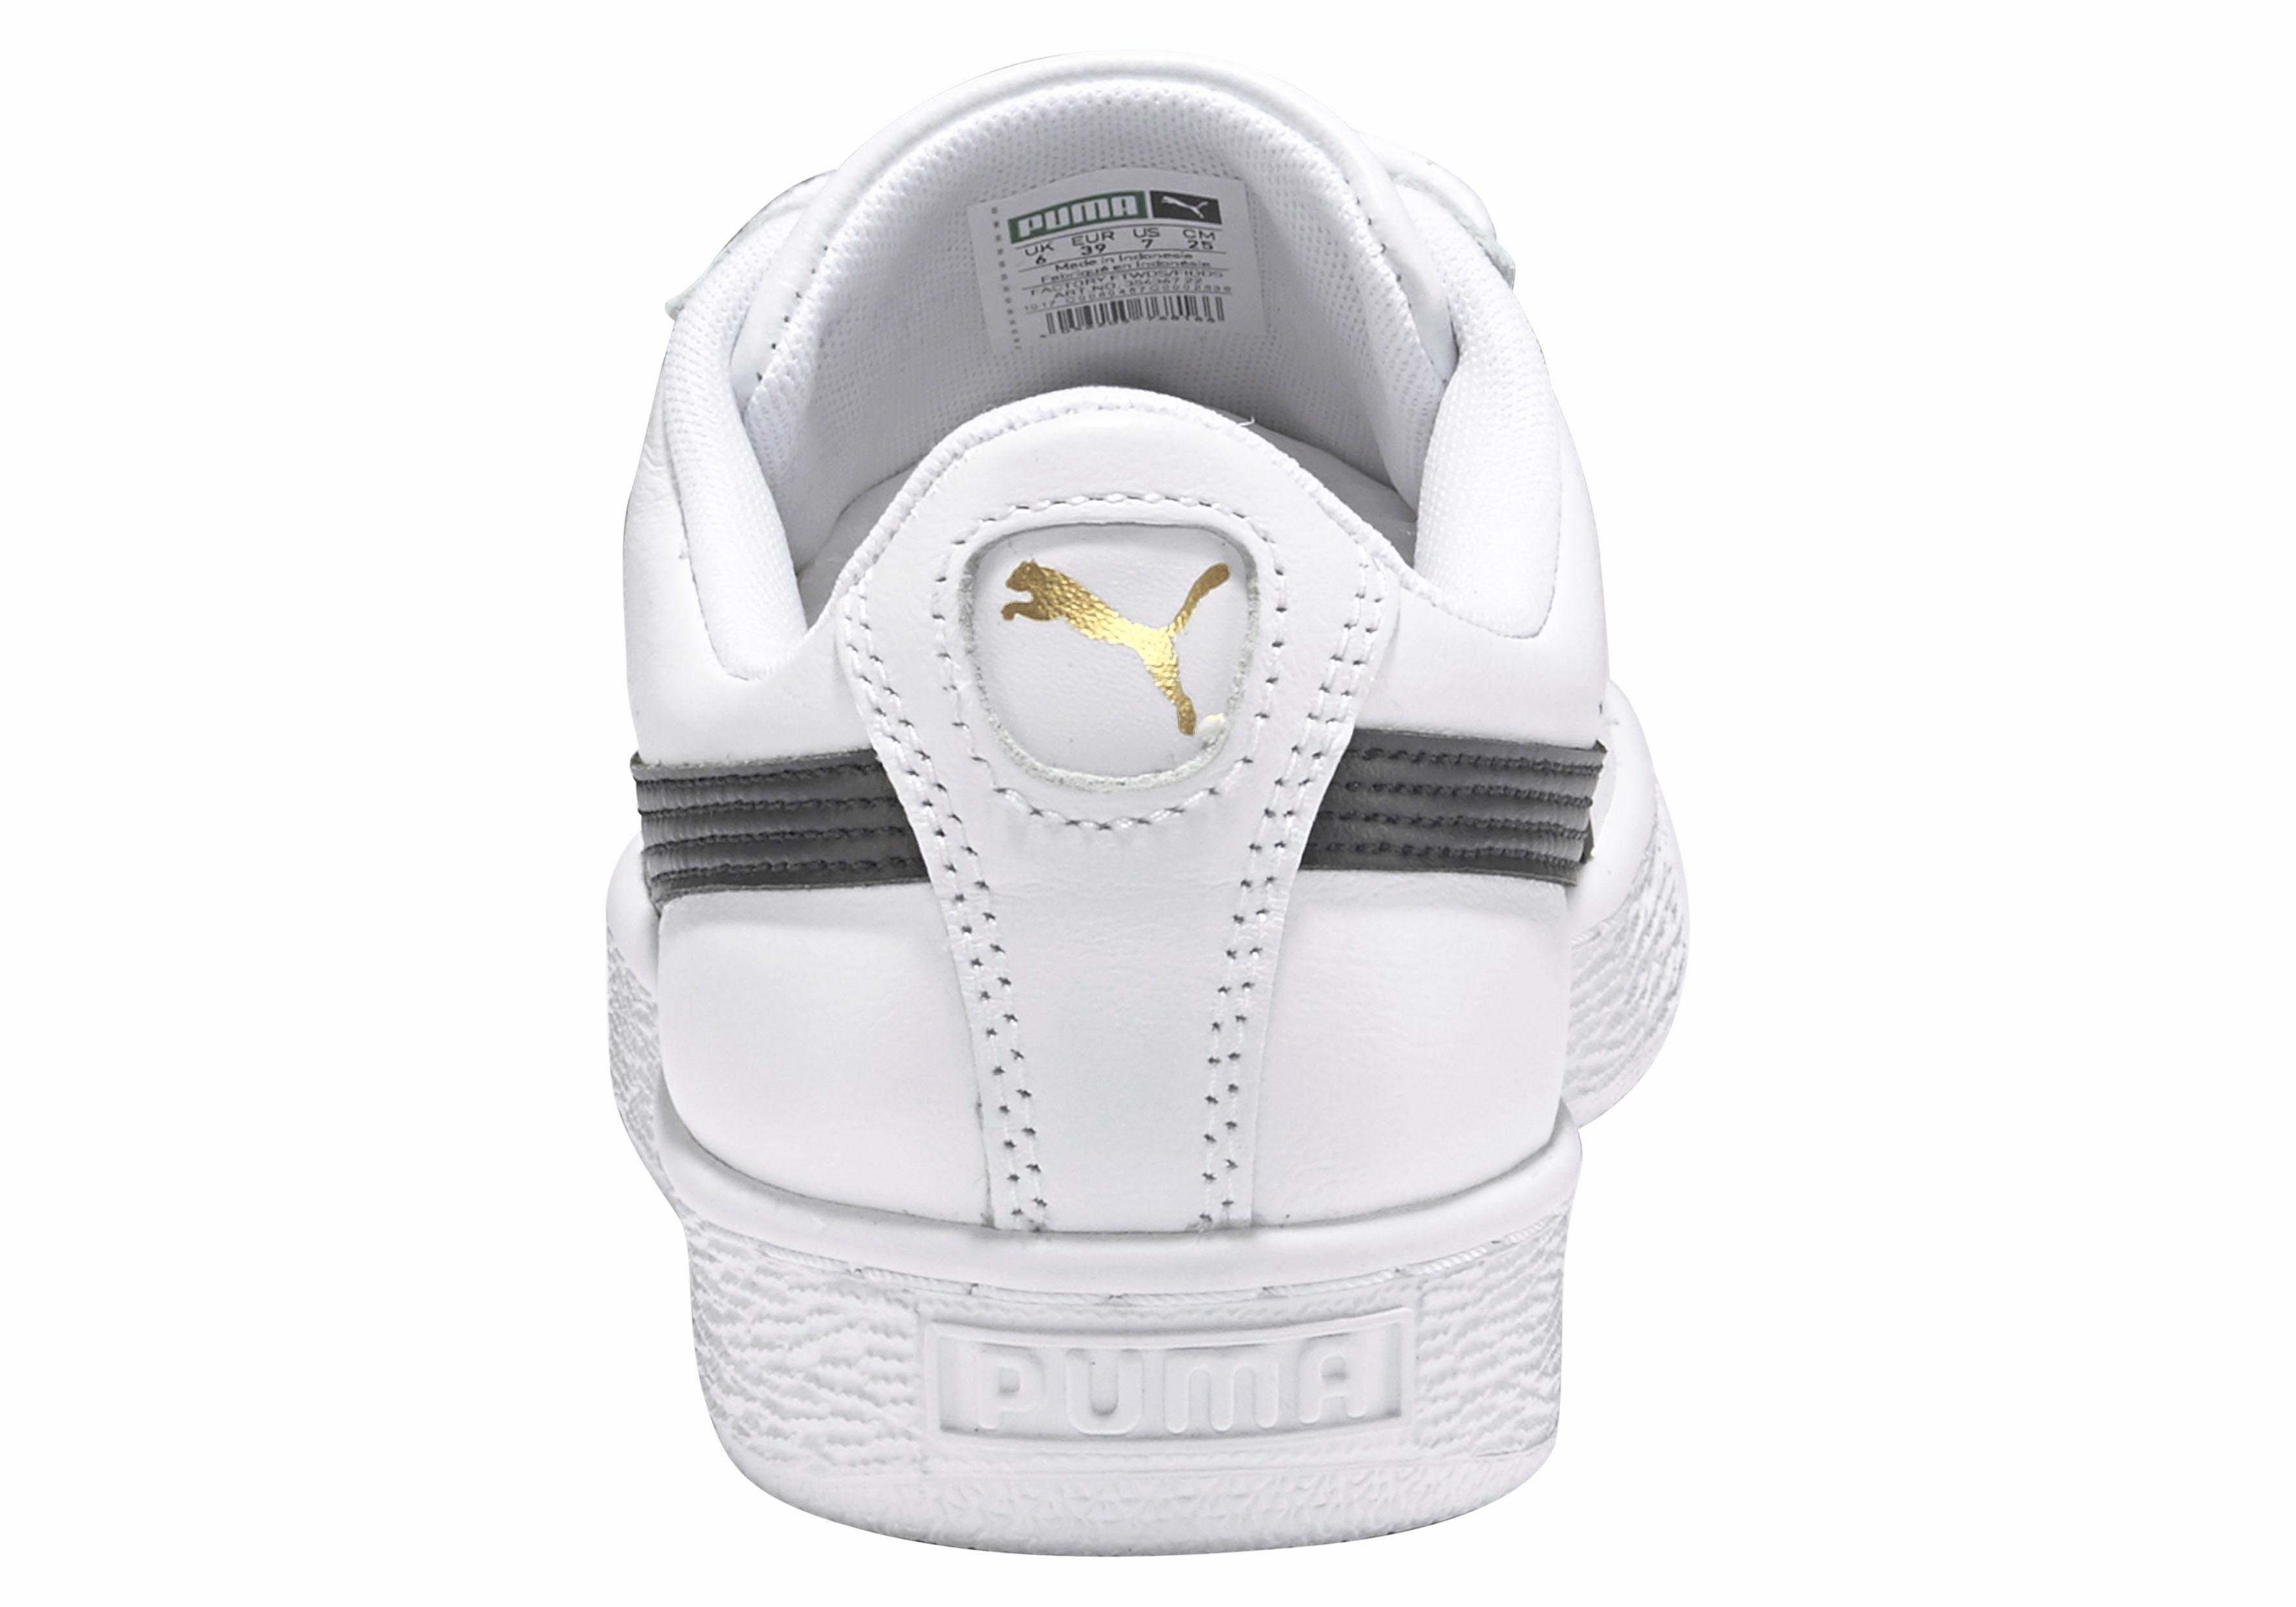 Lfs Online De Sneakersbasket Classic In Winkel Puma htQrds